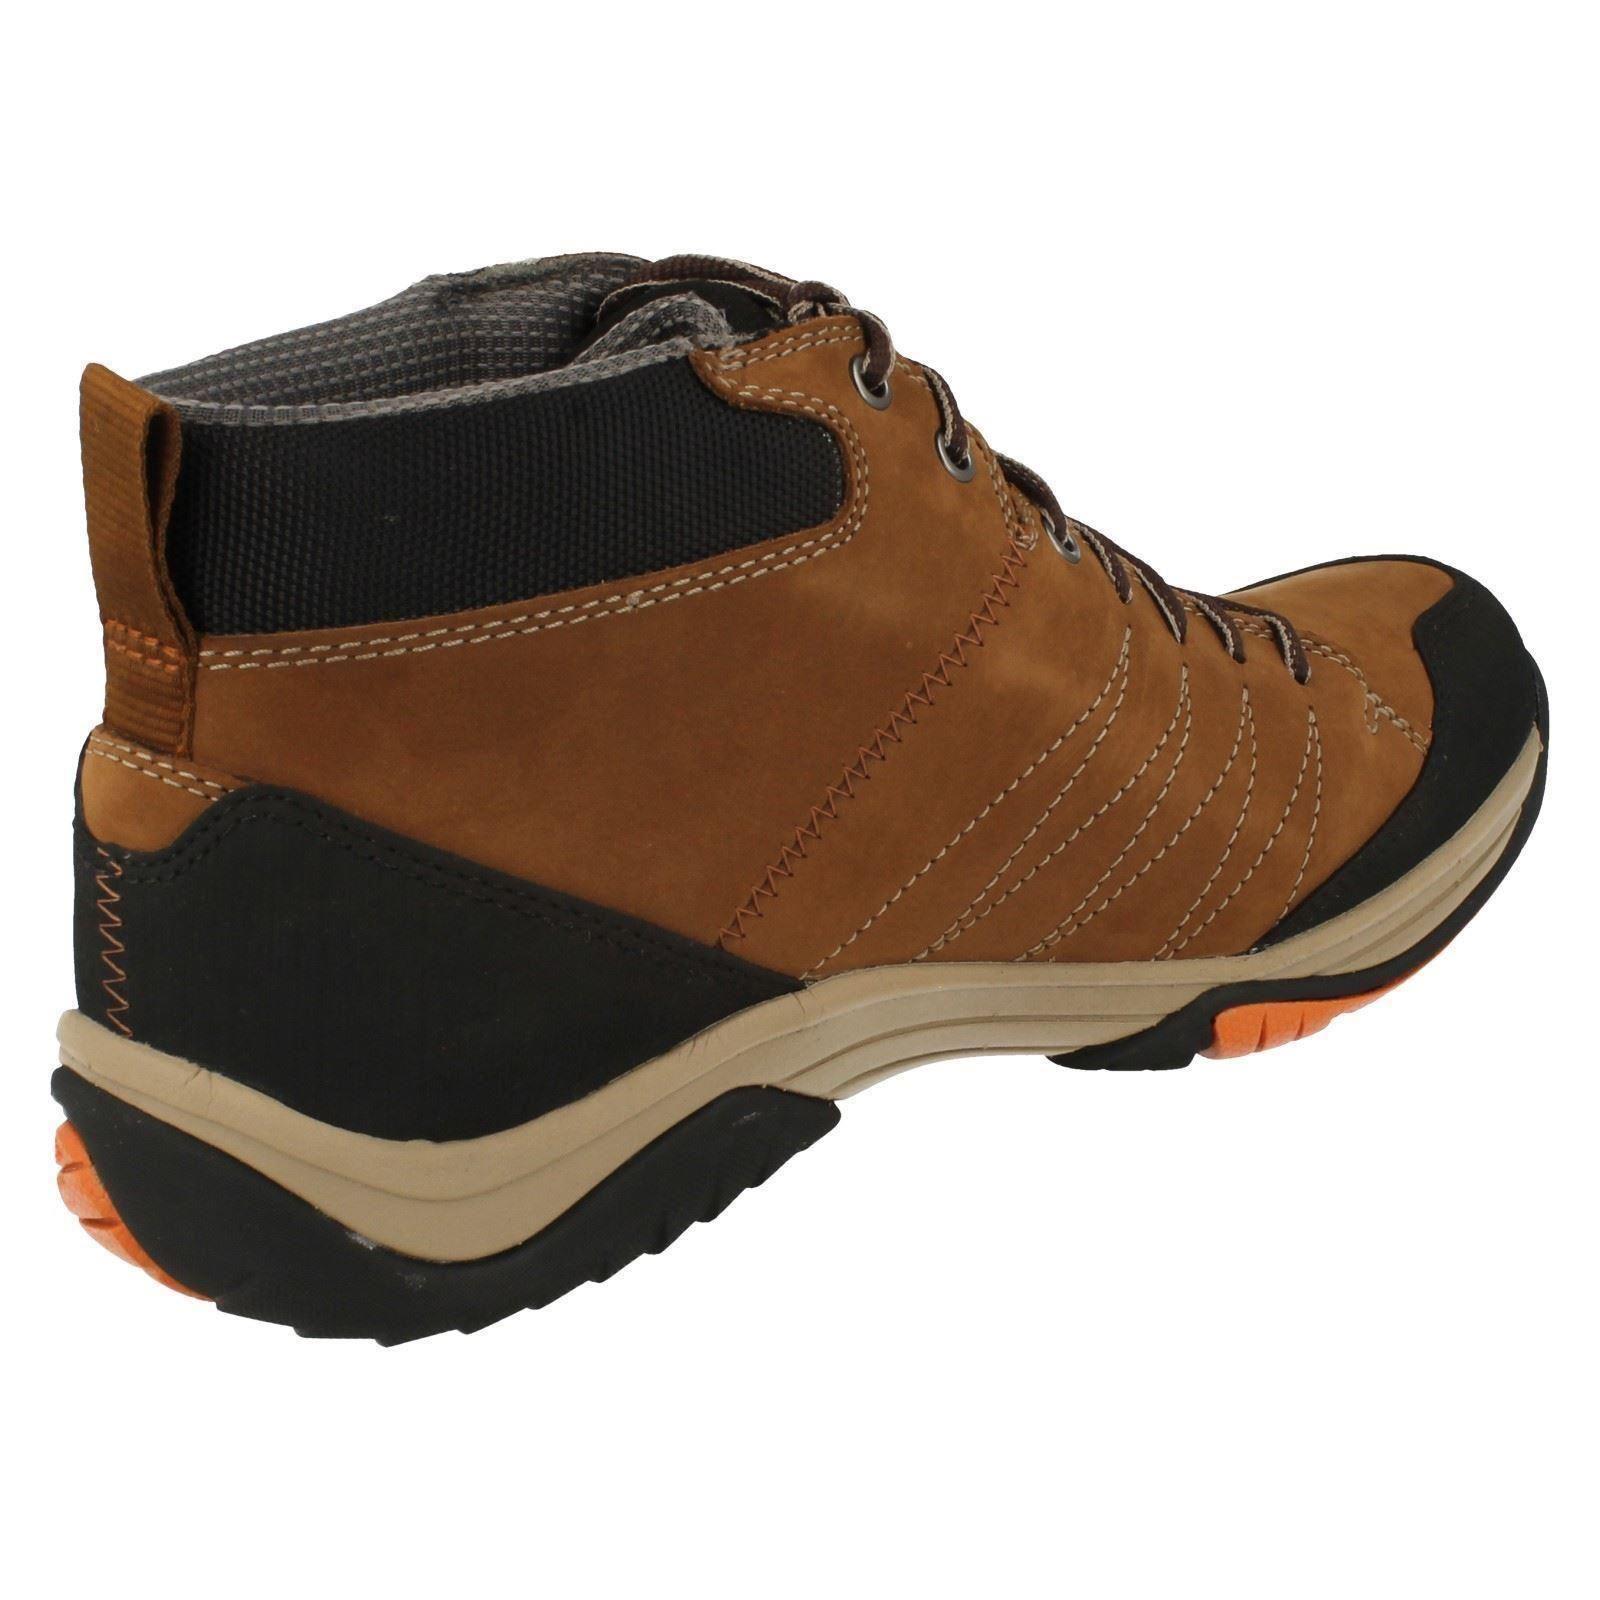 Hombre Clarks Ankle botas botas botas Baystoneup GTX 50b28c